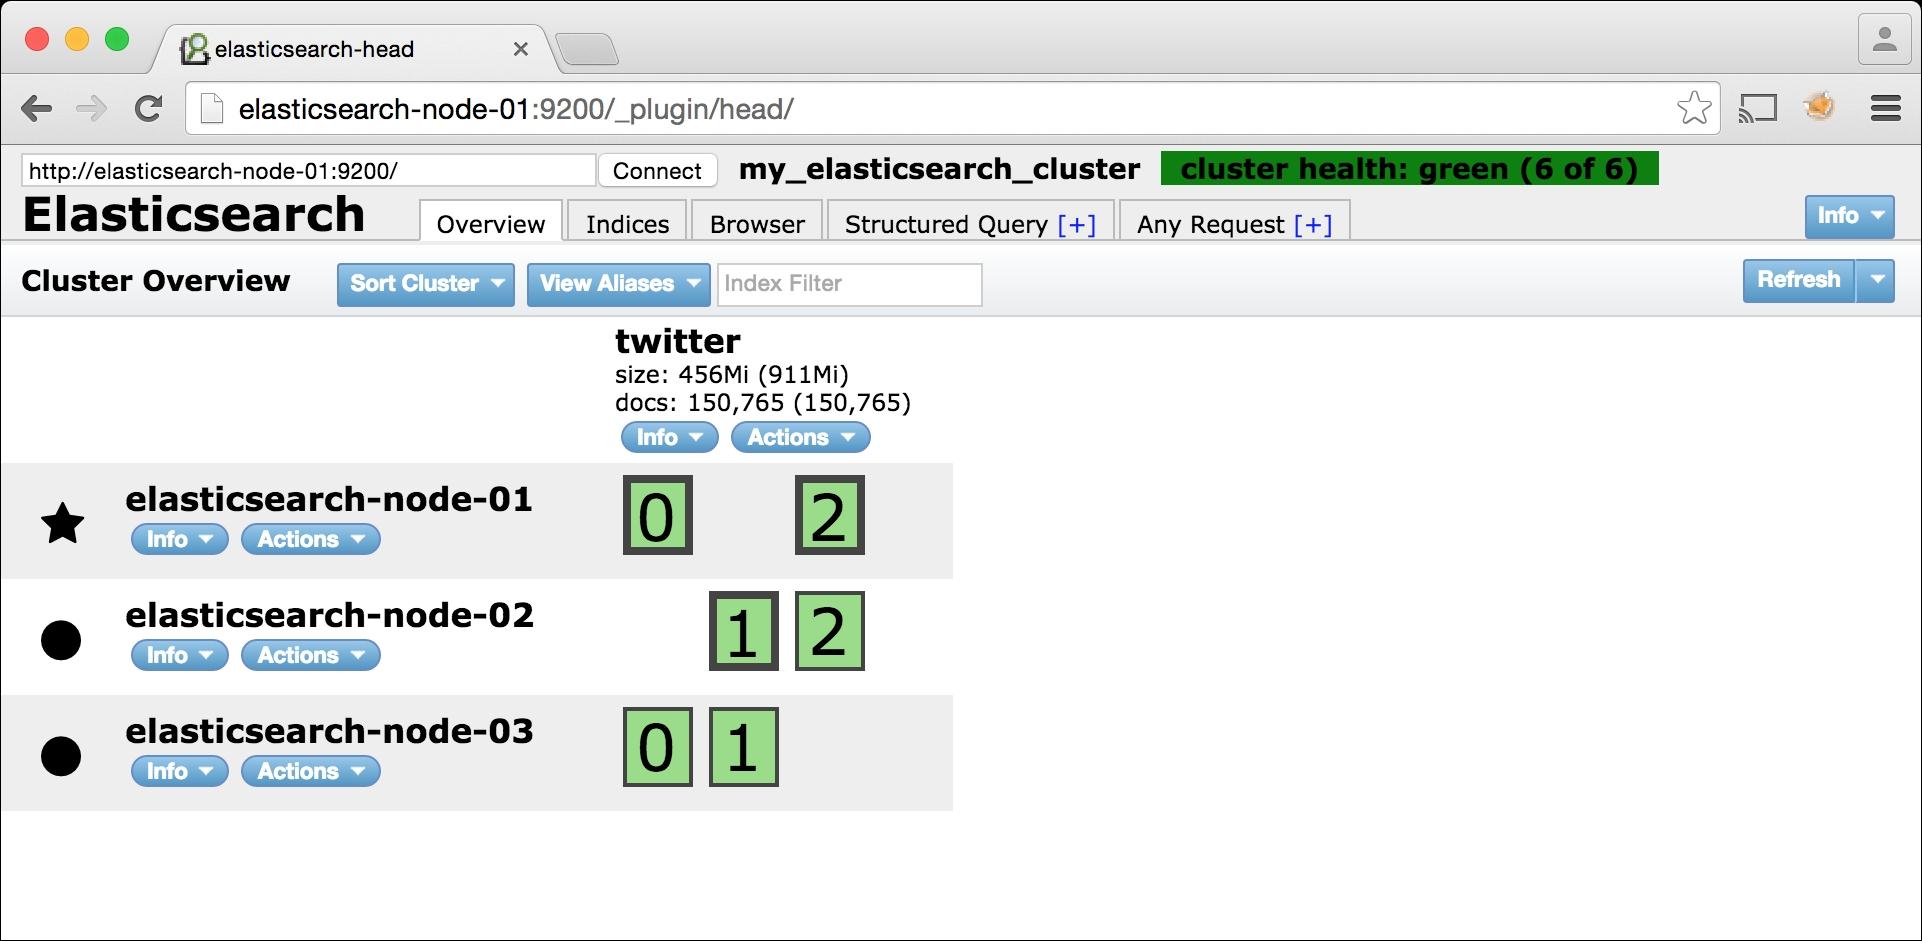 Elasticsearch-head - Monitoring Elasticsearch